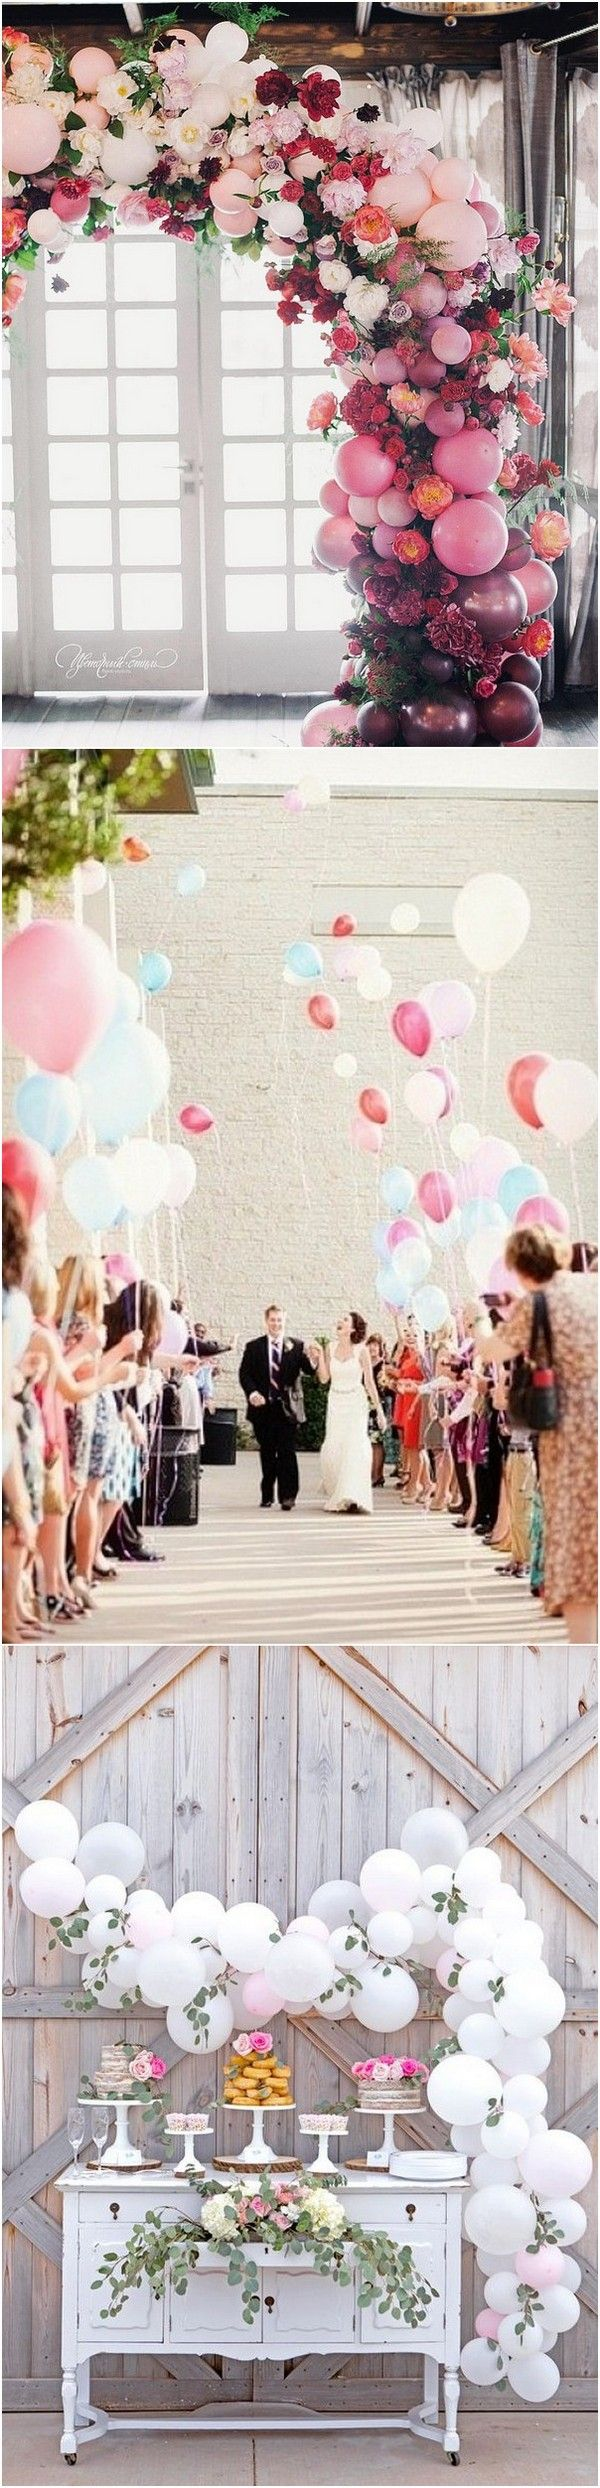 Wedding decoration ideas balloons   Romantic Wedding Decoration Ideas with Balloons  Dessert table